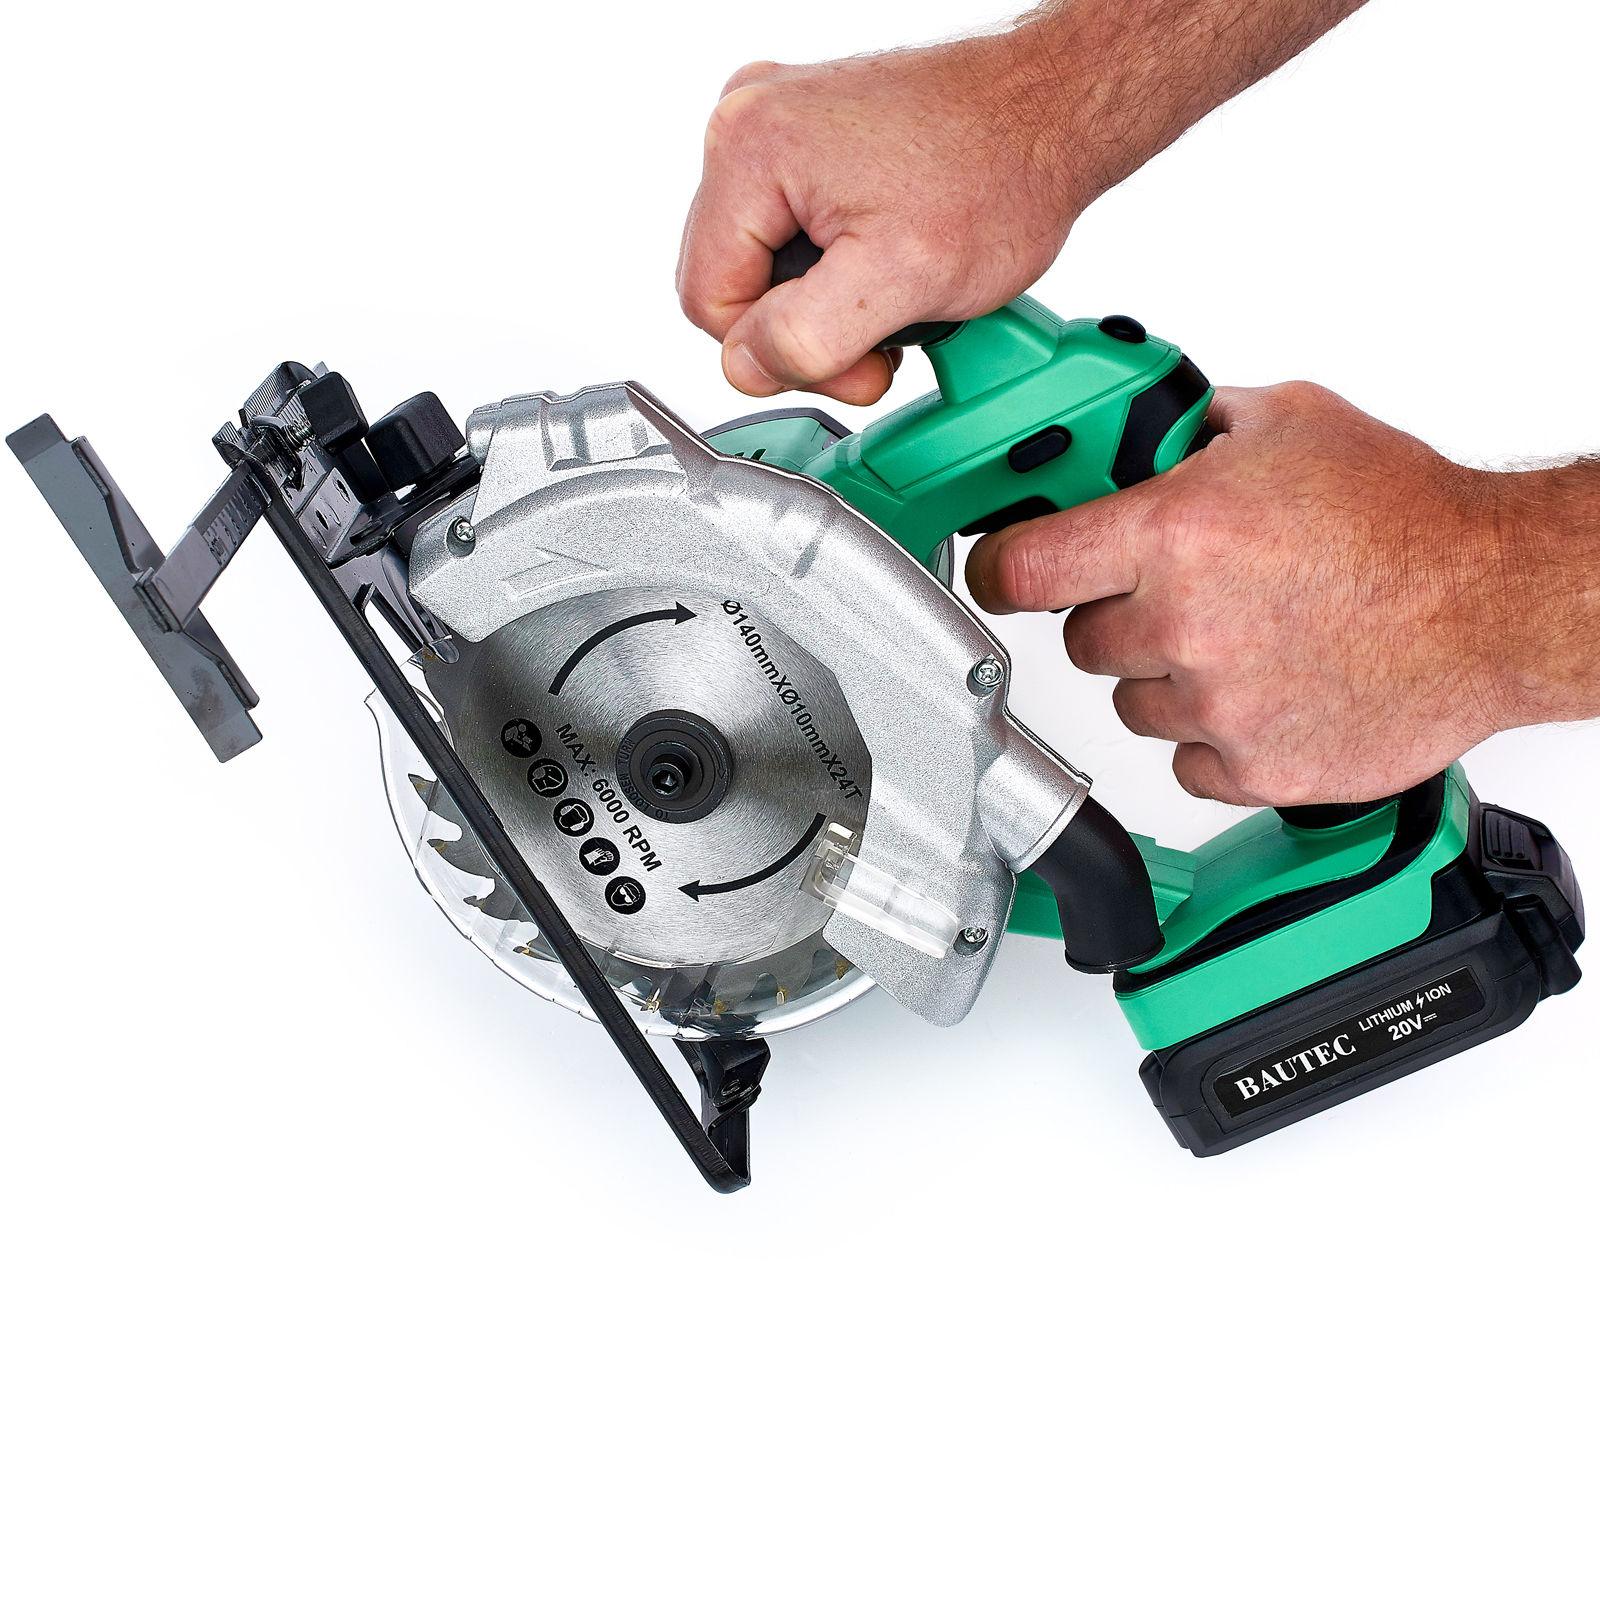 Berühmt Akku Handkreissäge - Kreissäge - Akku-Werkzeuge günstig kaufen ✓ #DO_75